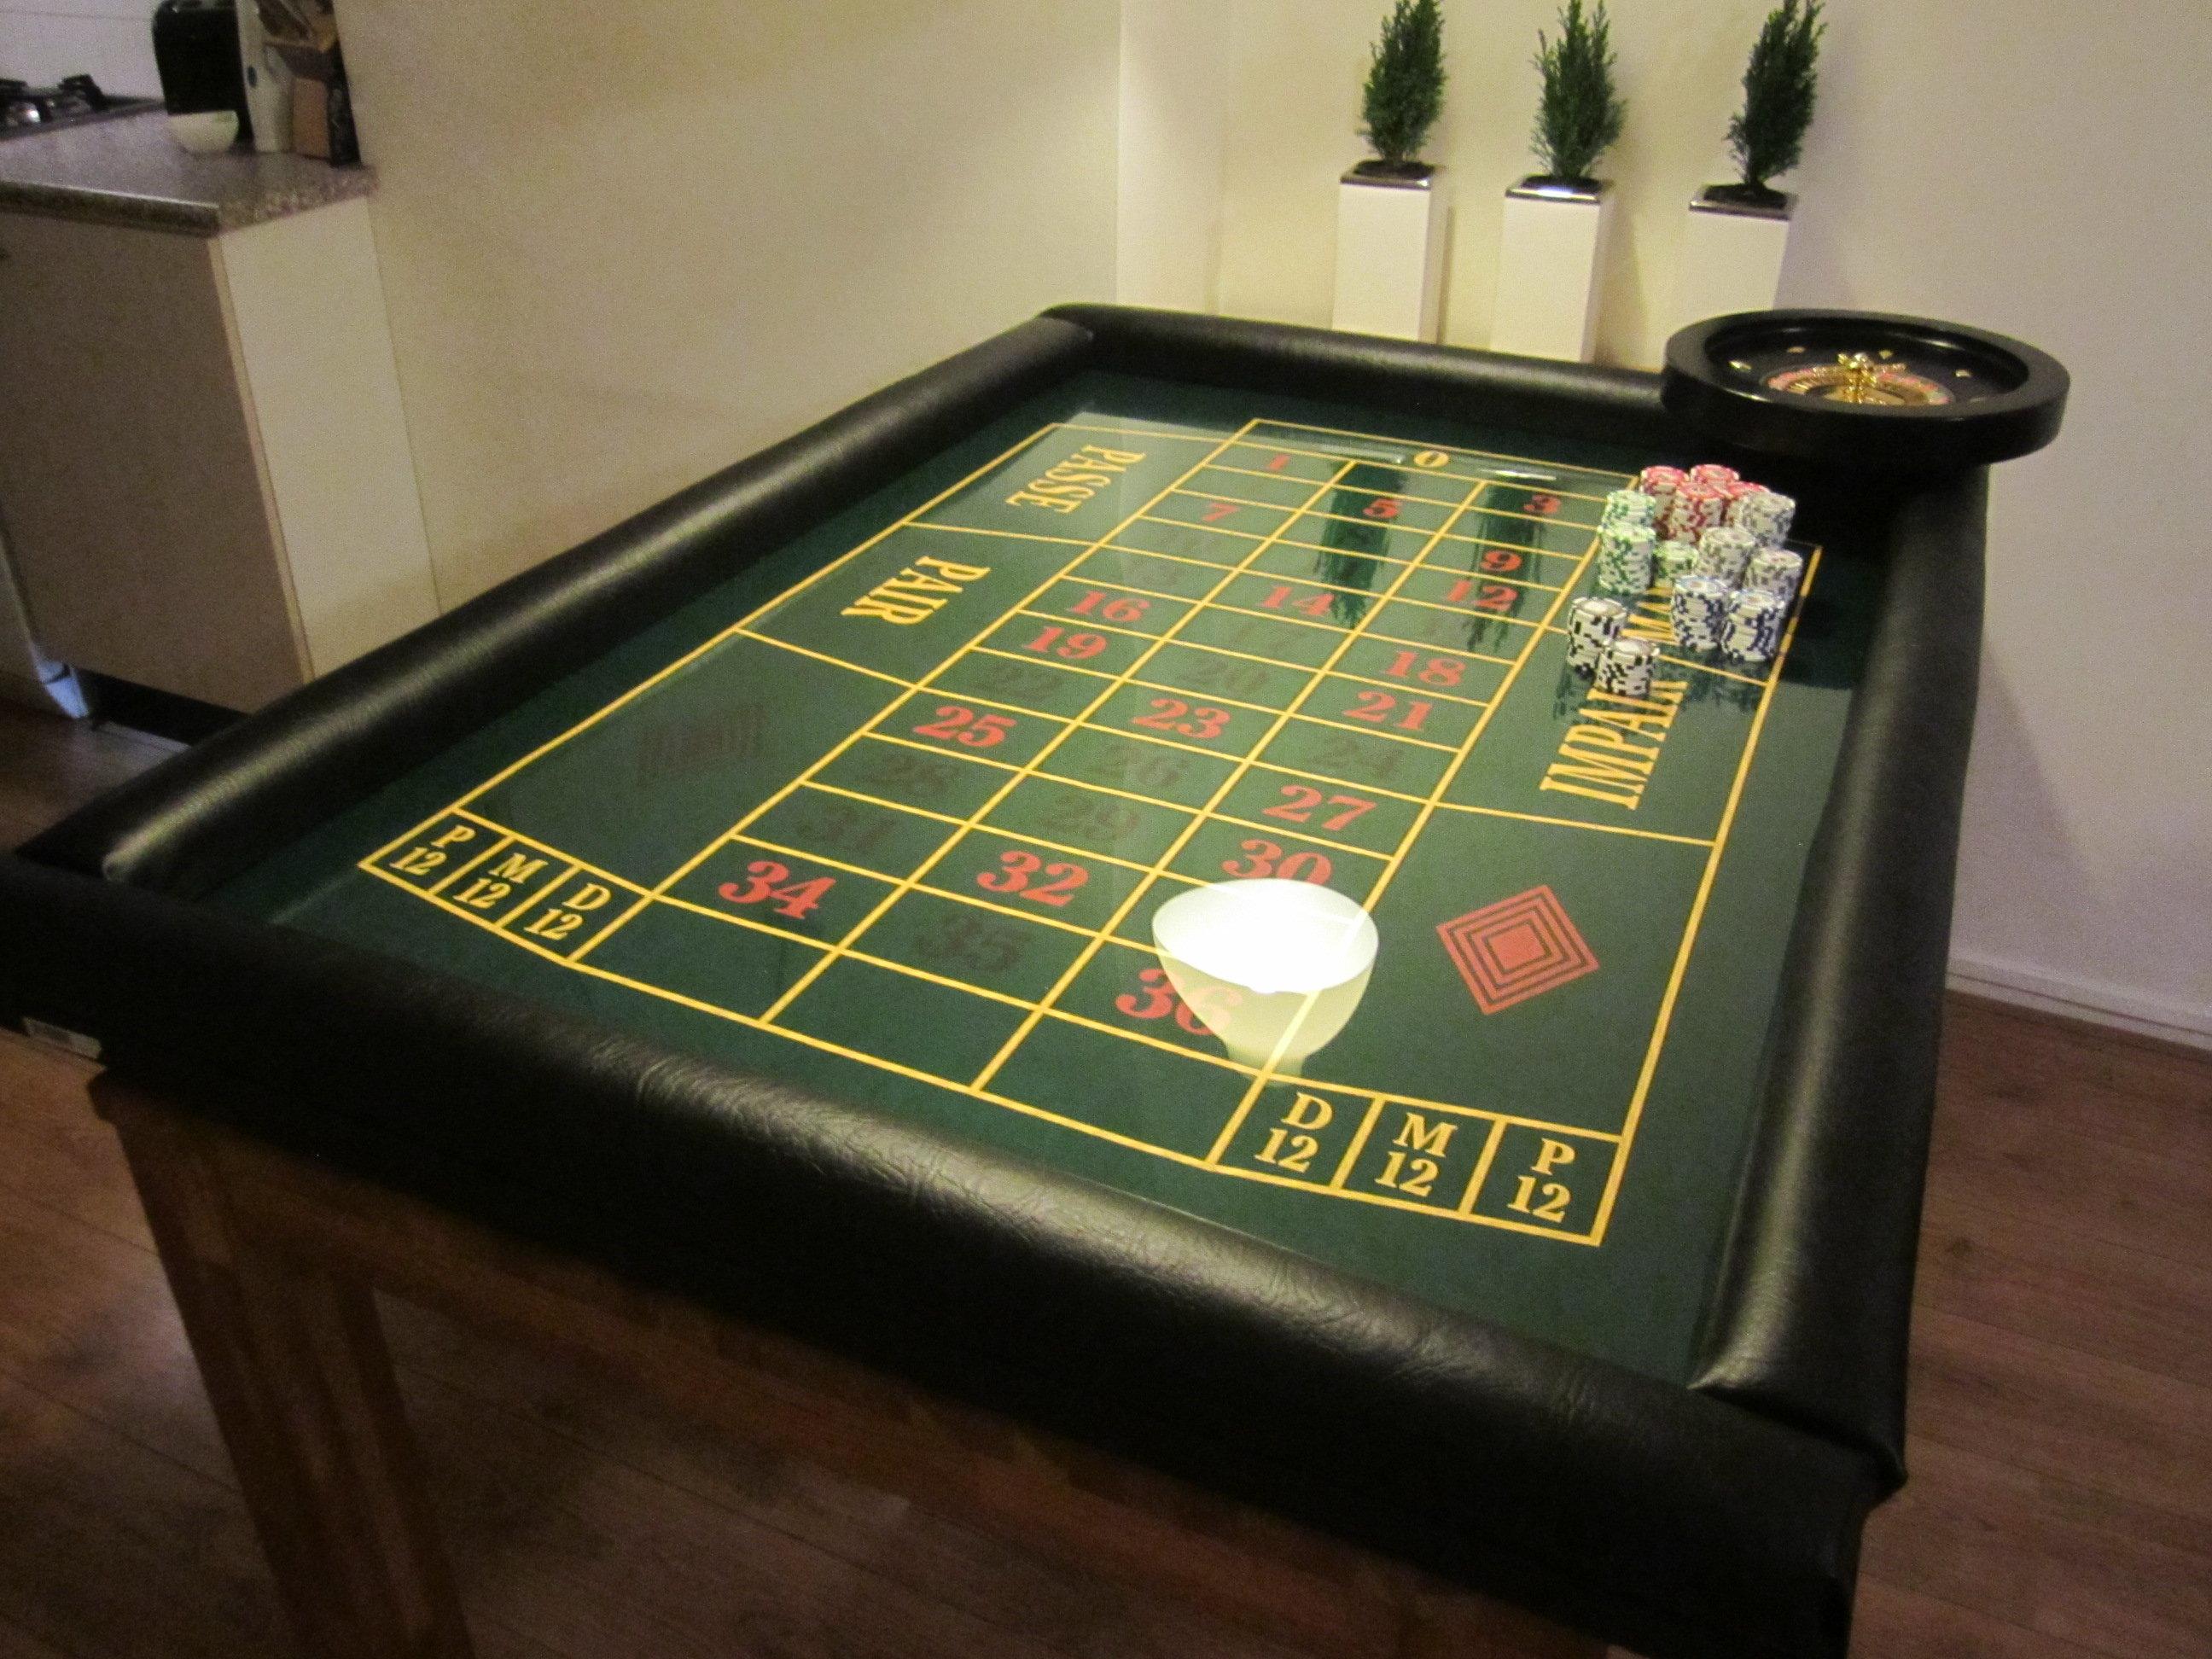 Roulette Tafel Kopen : Roulette tafel huren slechts u ac euro per week